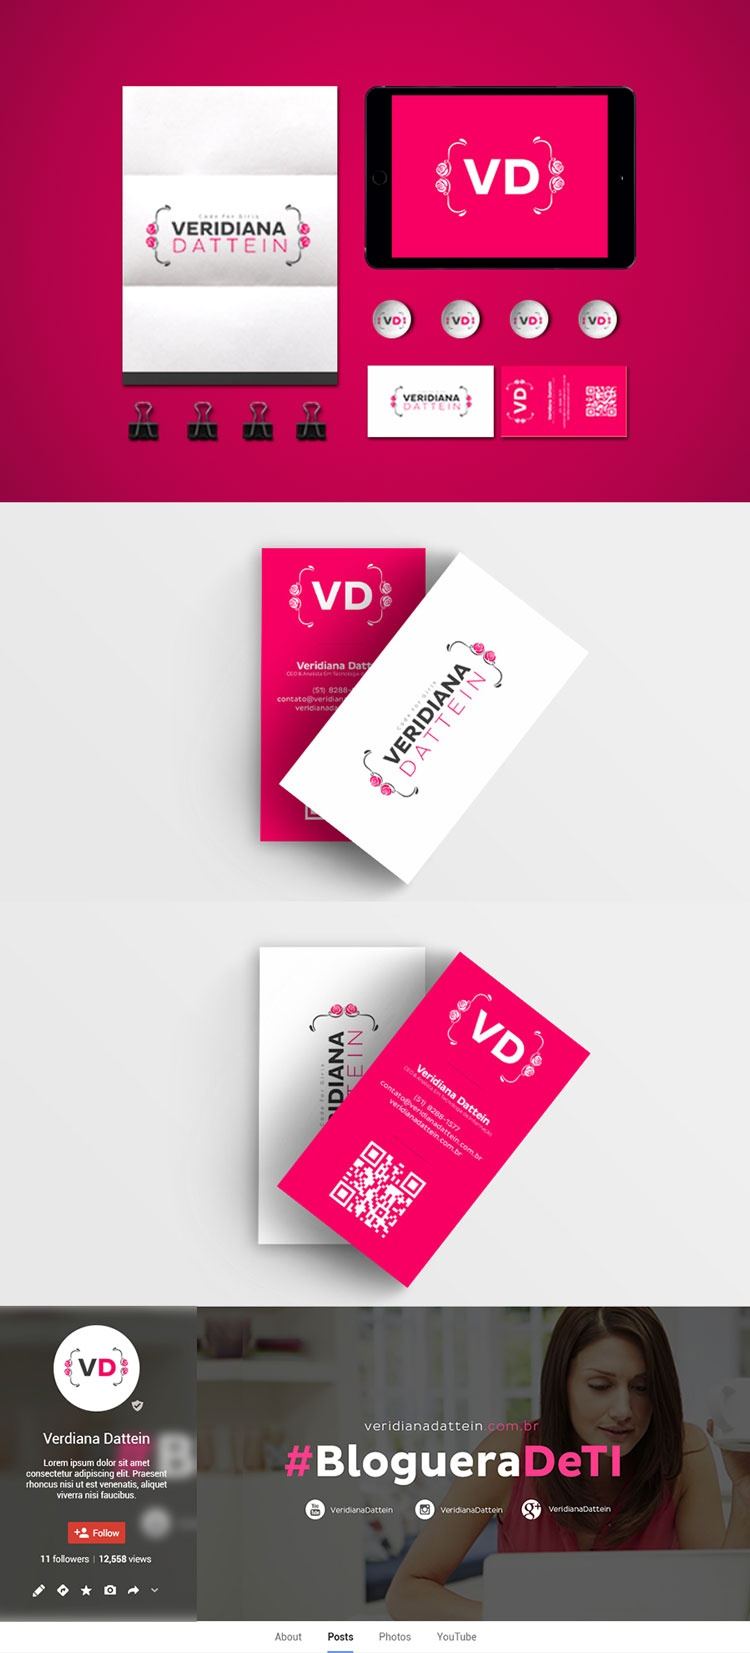 Identidade visual Veridiana Datein Blog de TI